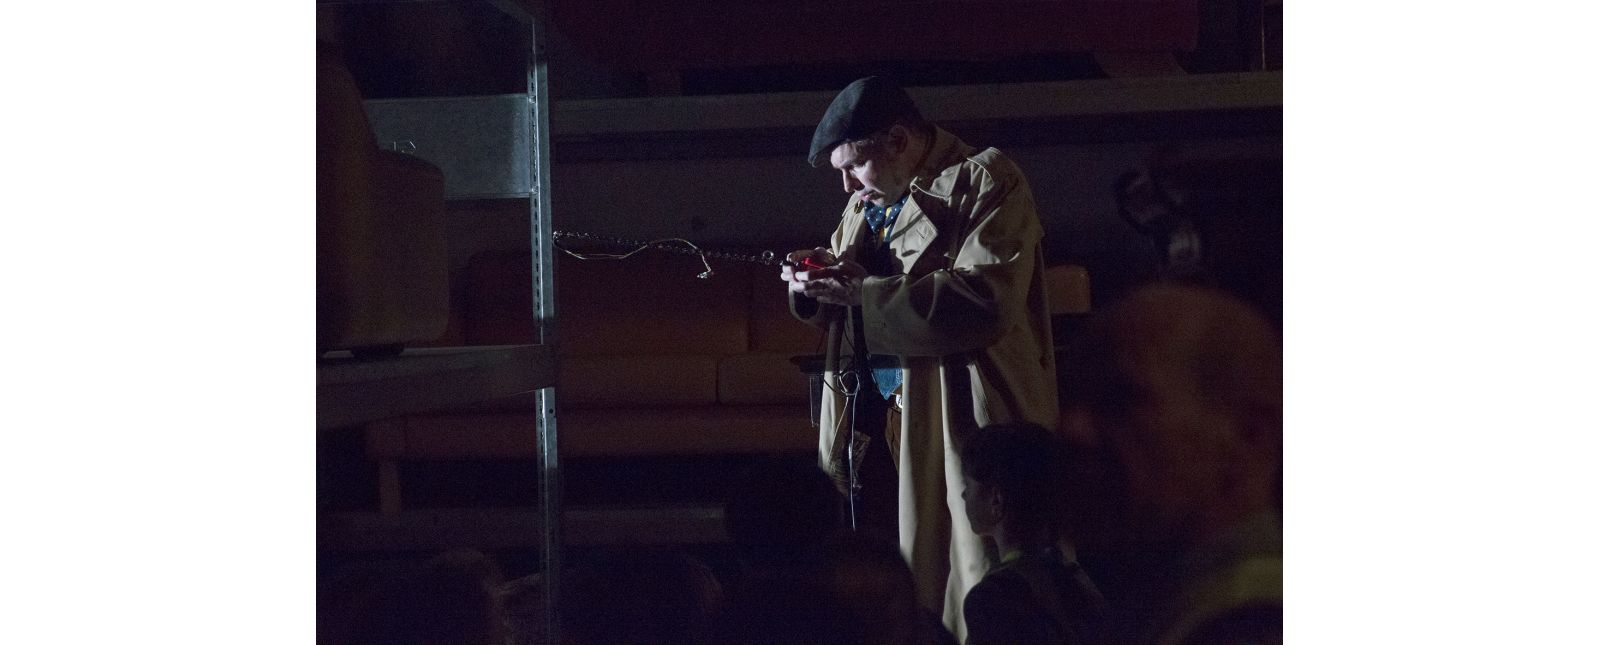 Geisterjagd durchs Theater // Christoph Kopp // 2015 // Rainer Muranyi